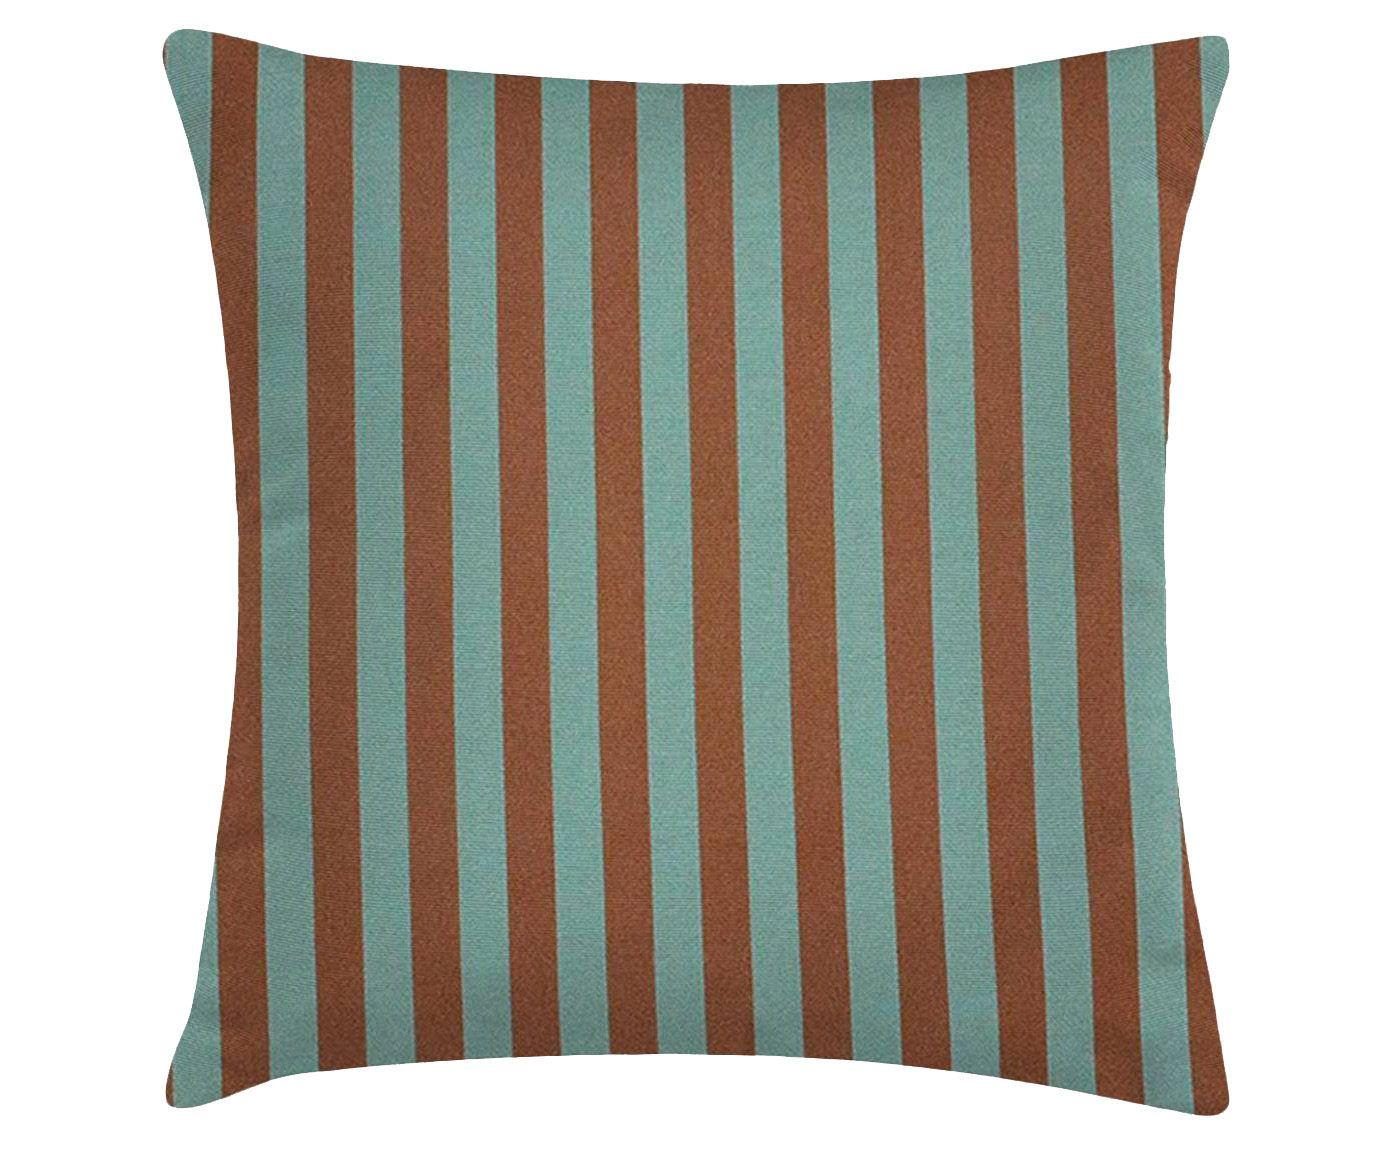 Capa para almofada palmas stripes zen - 45x45cm | Westwing.com.br